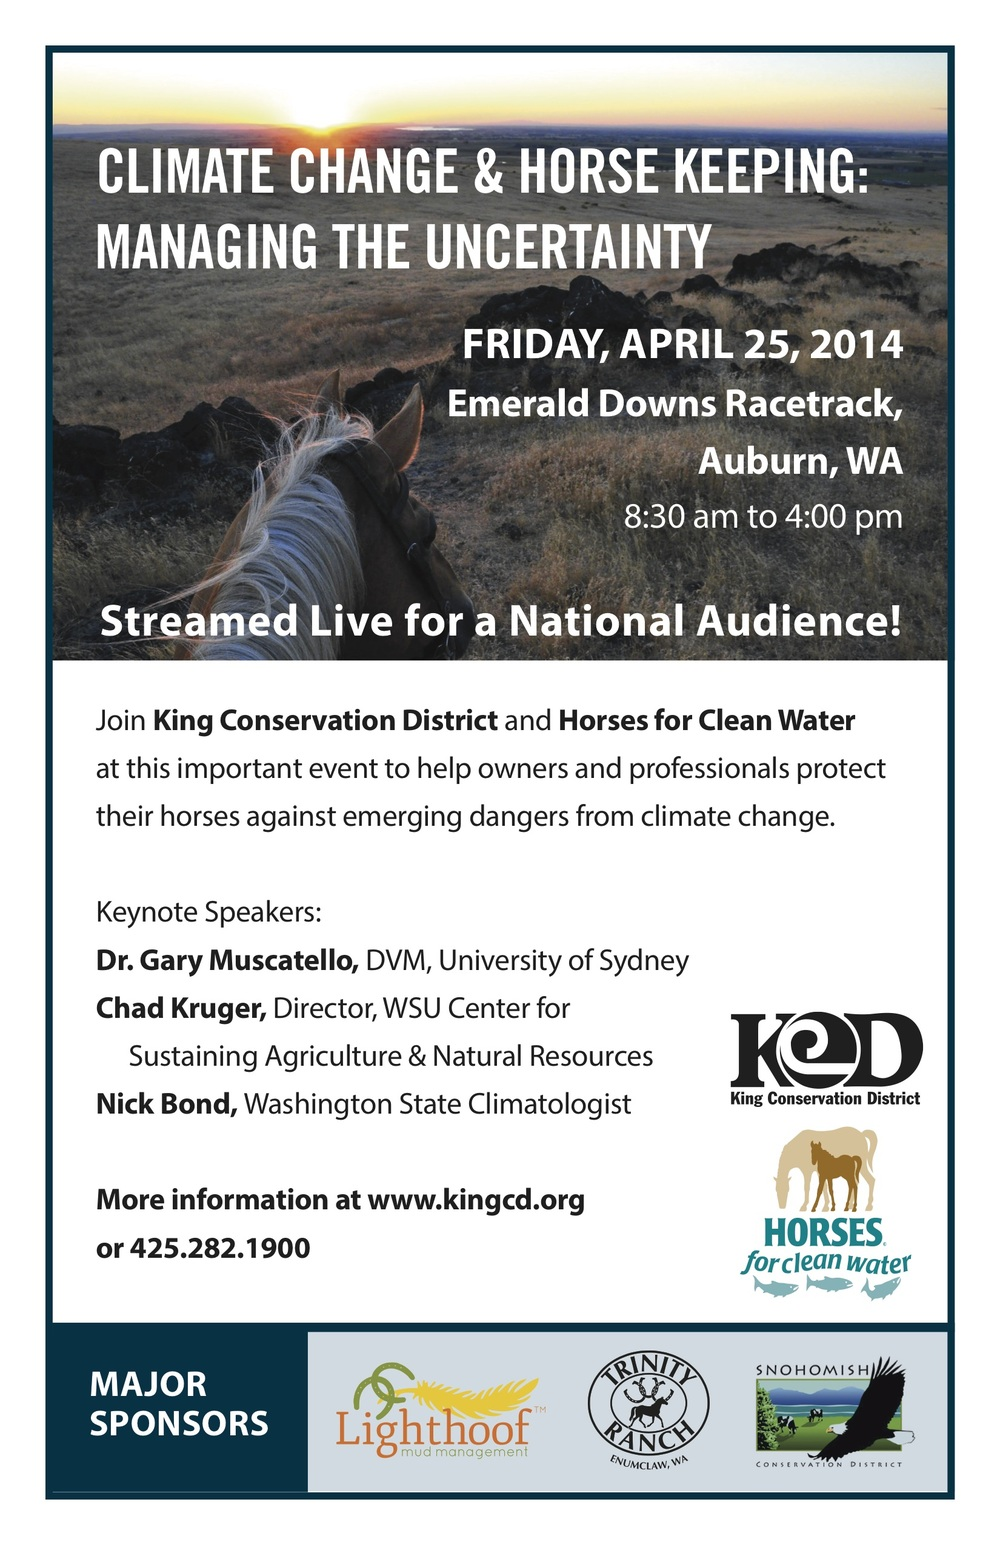 KCD_Horsekeeping-ClimateChange_Poster_FINAL.jpg